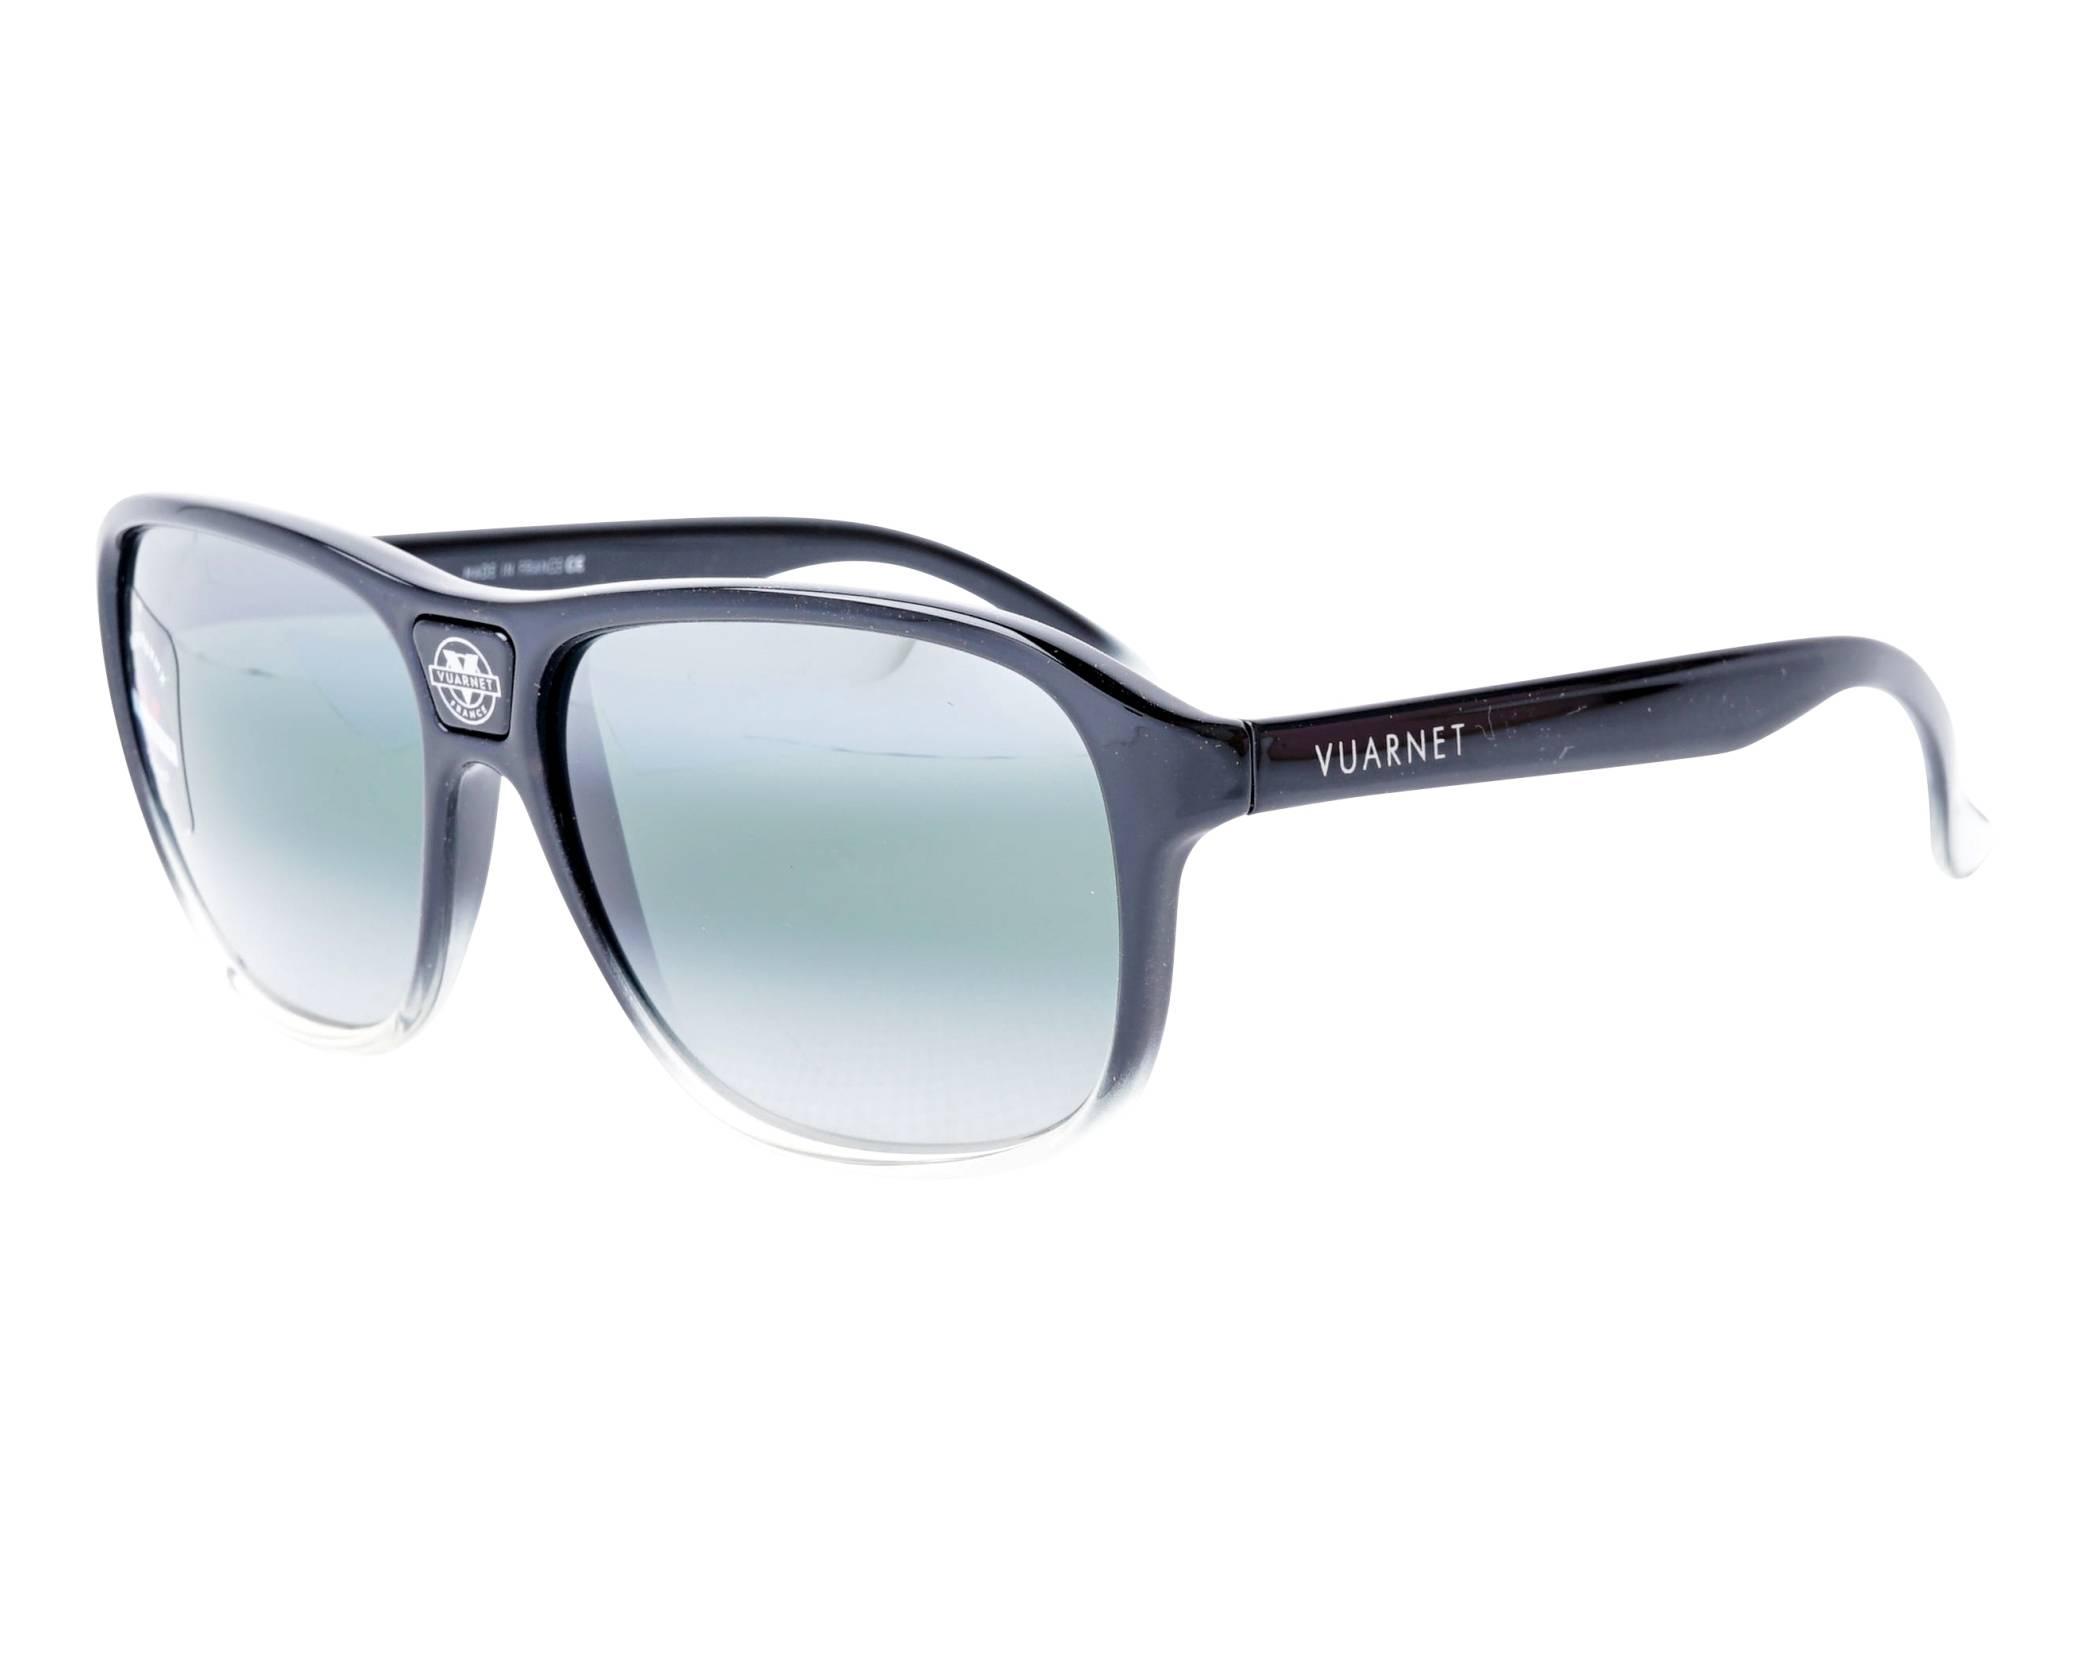 ccac03815b Sunglasses Vuarnet VL-0003 0009-1136 60-16 Black Crystal profile view